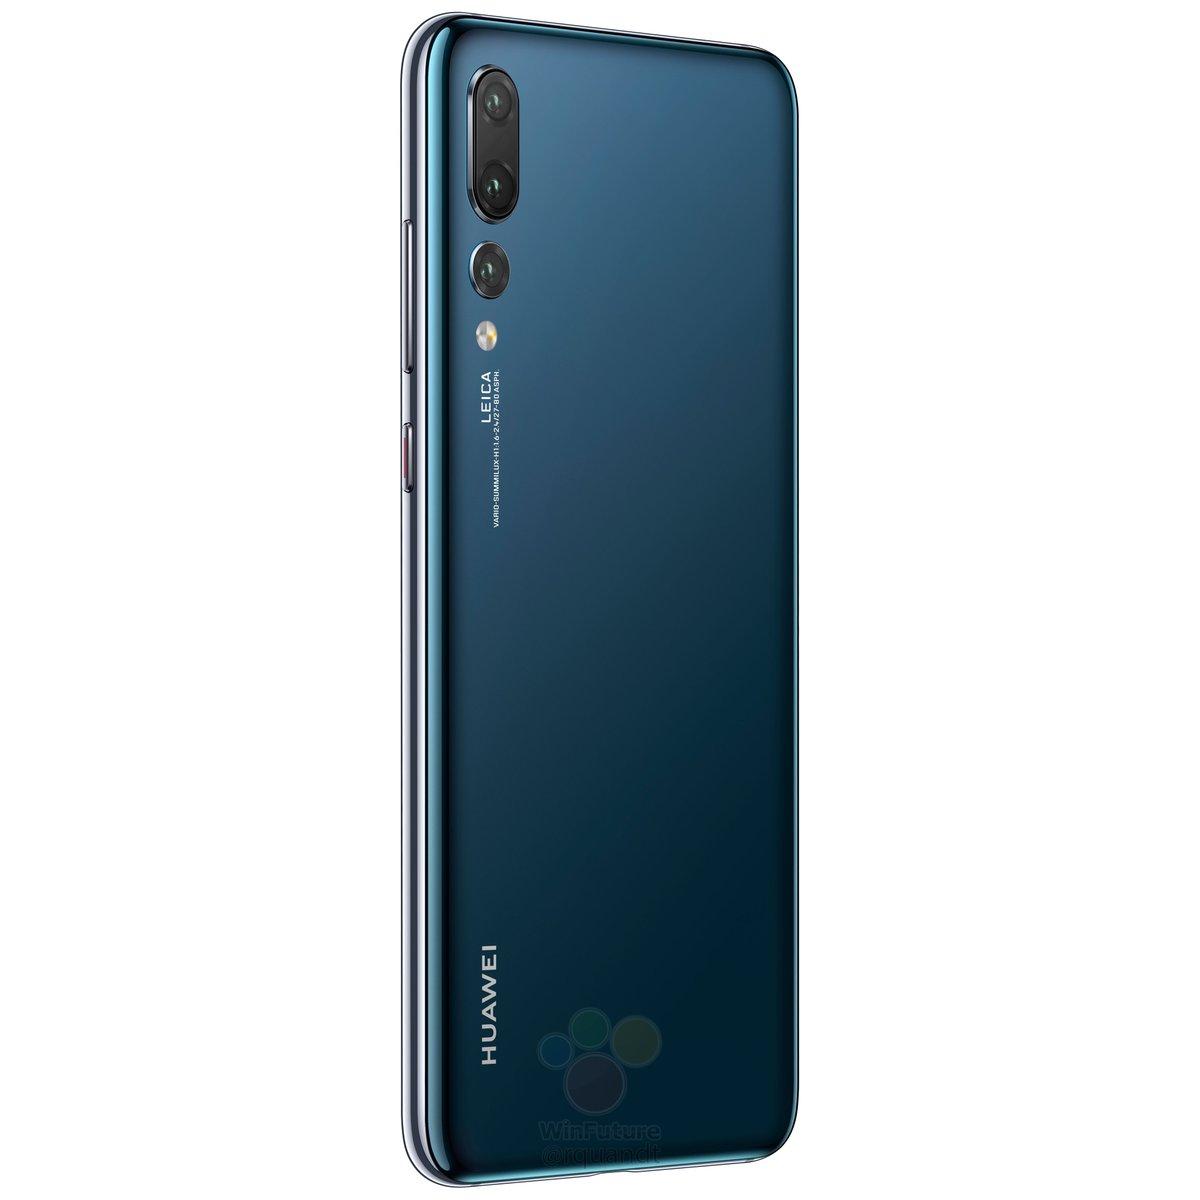 Huawei-P20-Pro-11